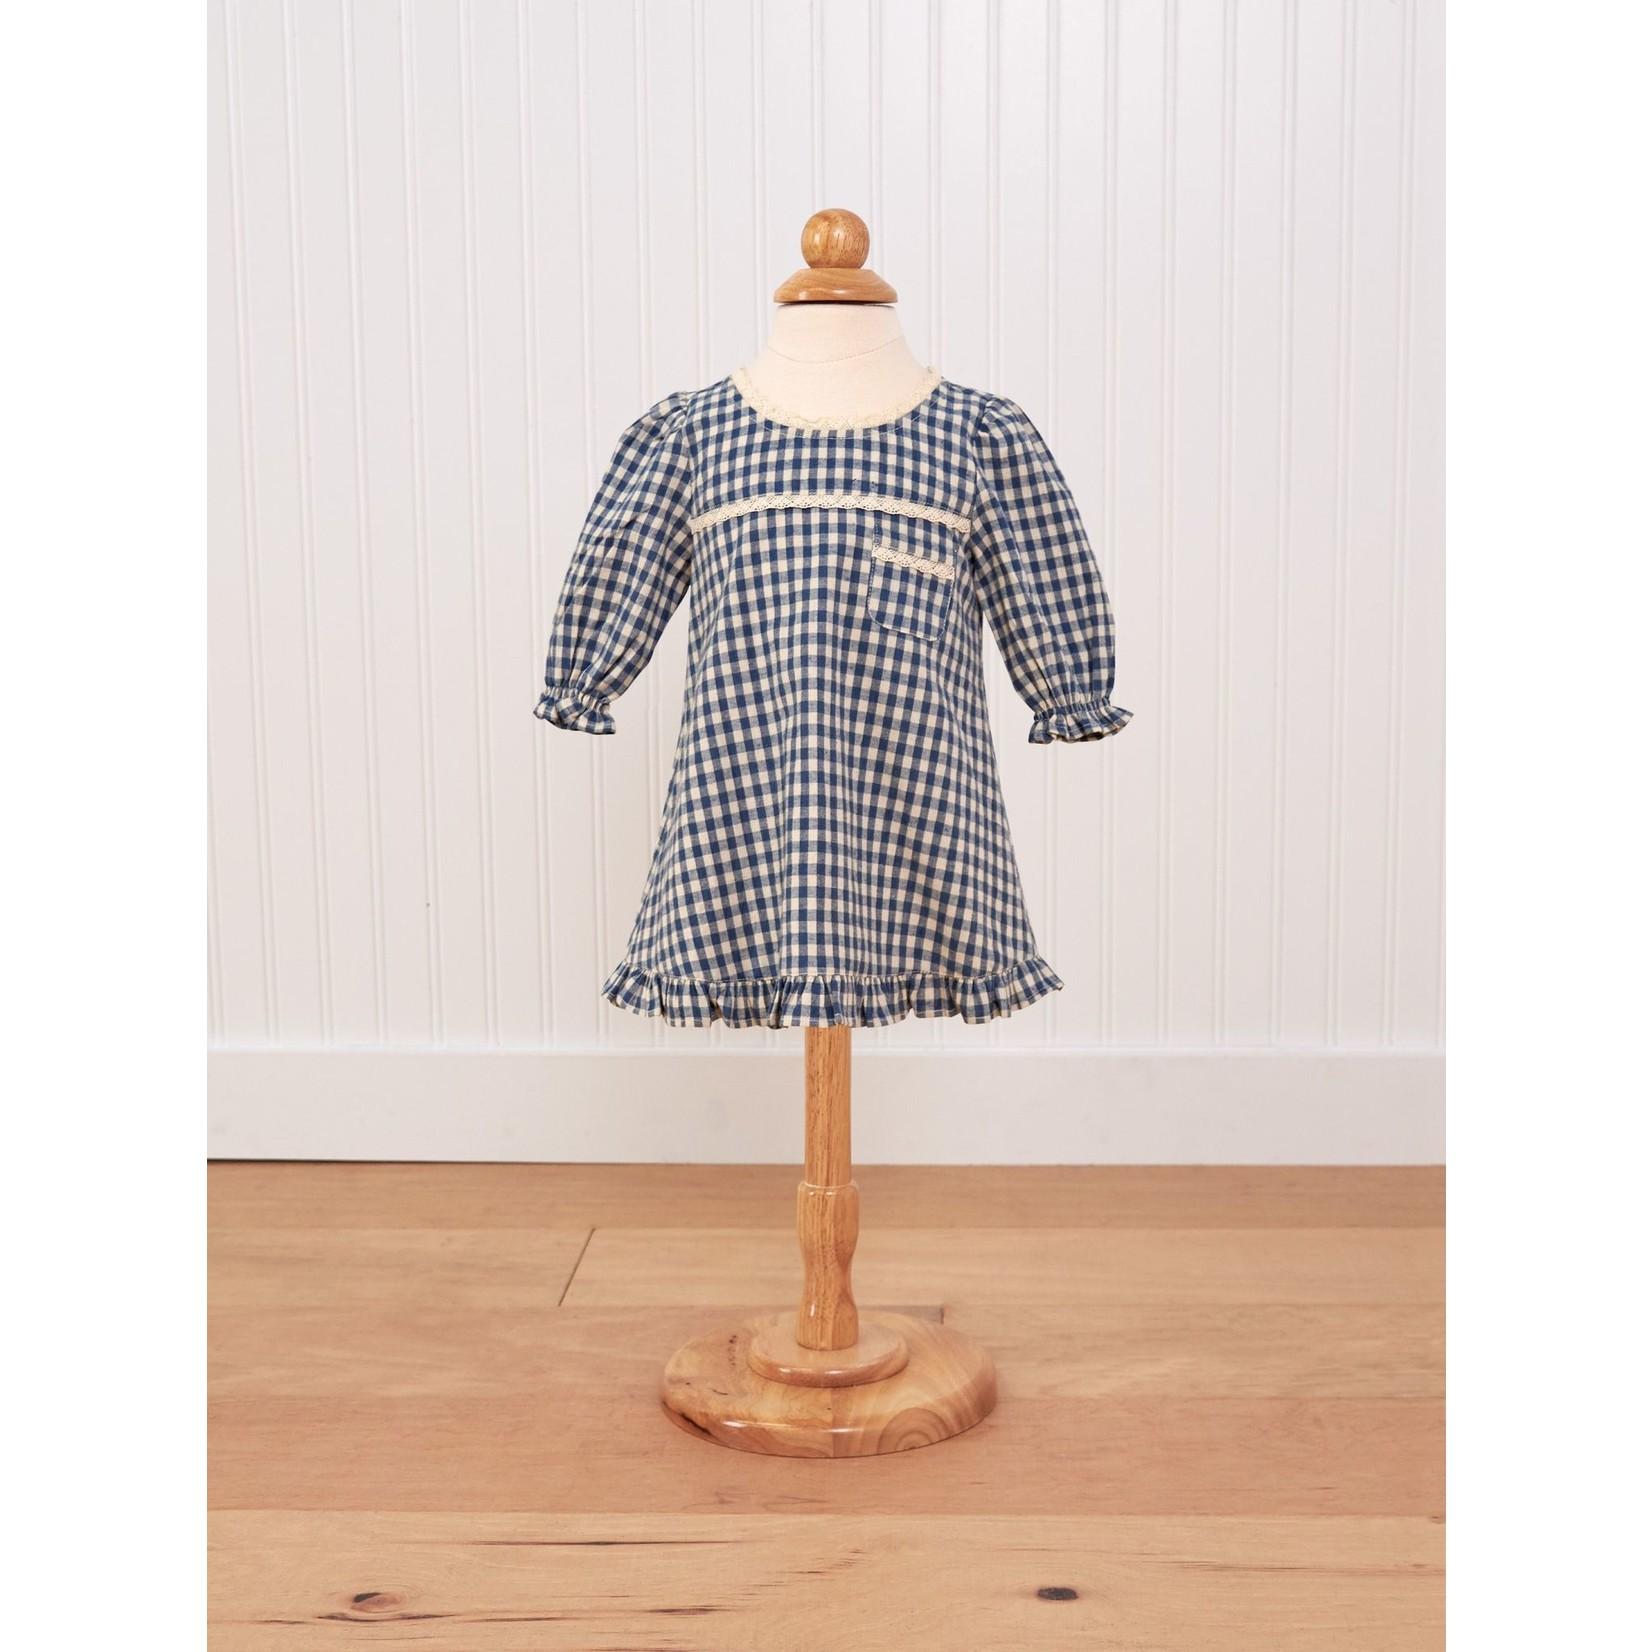 April Cornell Tanya Baby Dress - Teal/Ecru